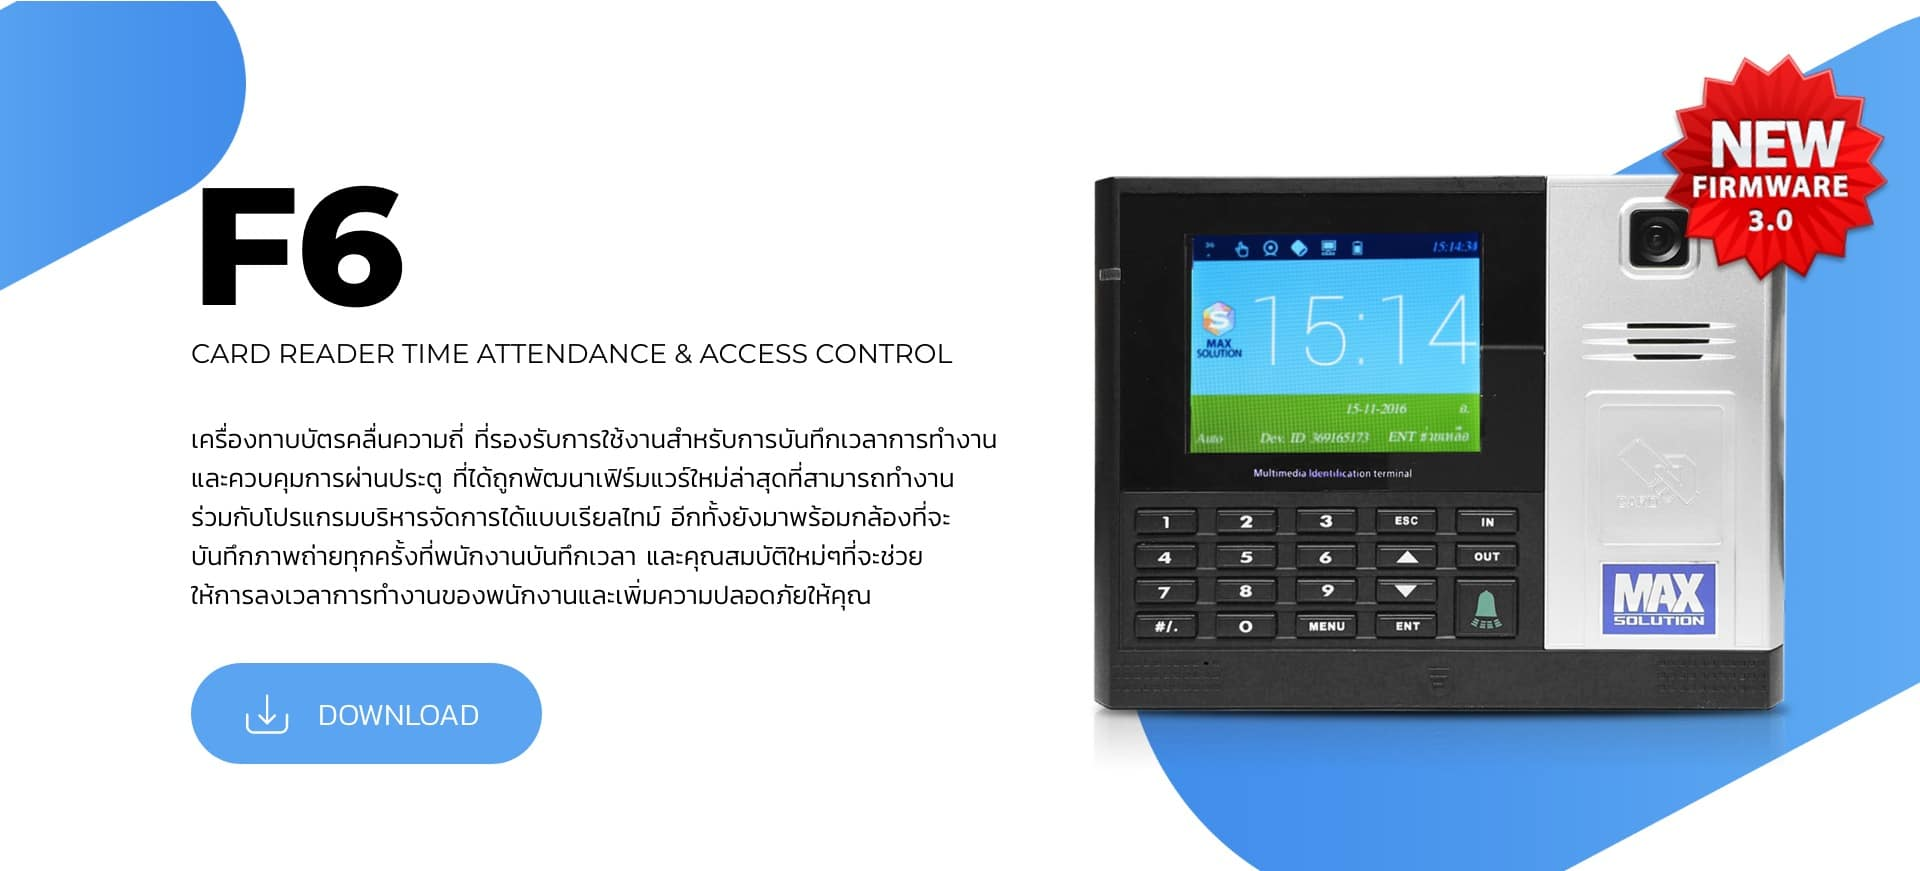 F6 เครื่องทาบบัตร แบบคลื่นความถี่ RFID Card Reader